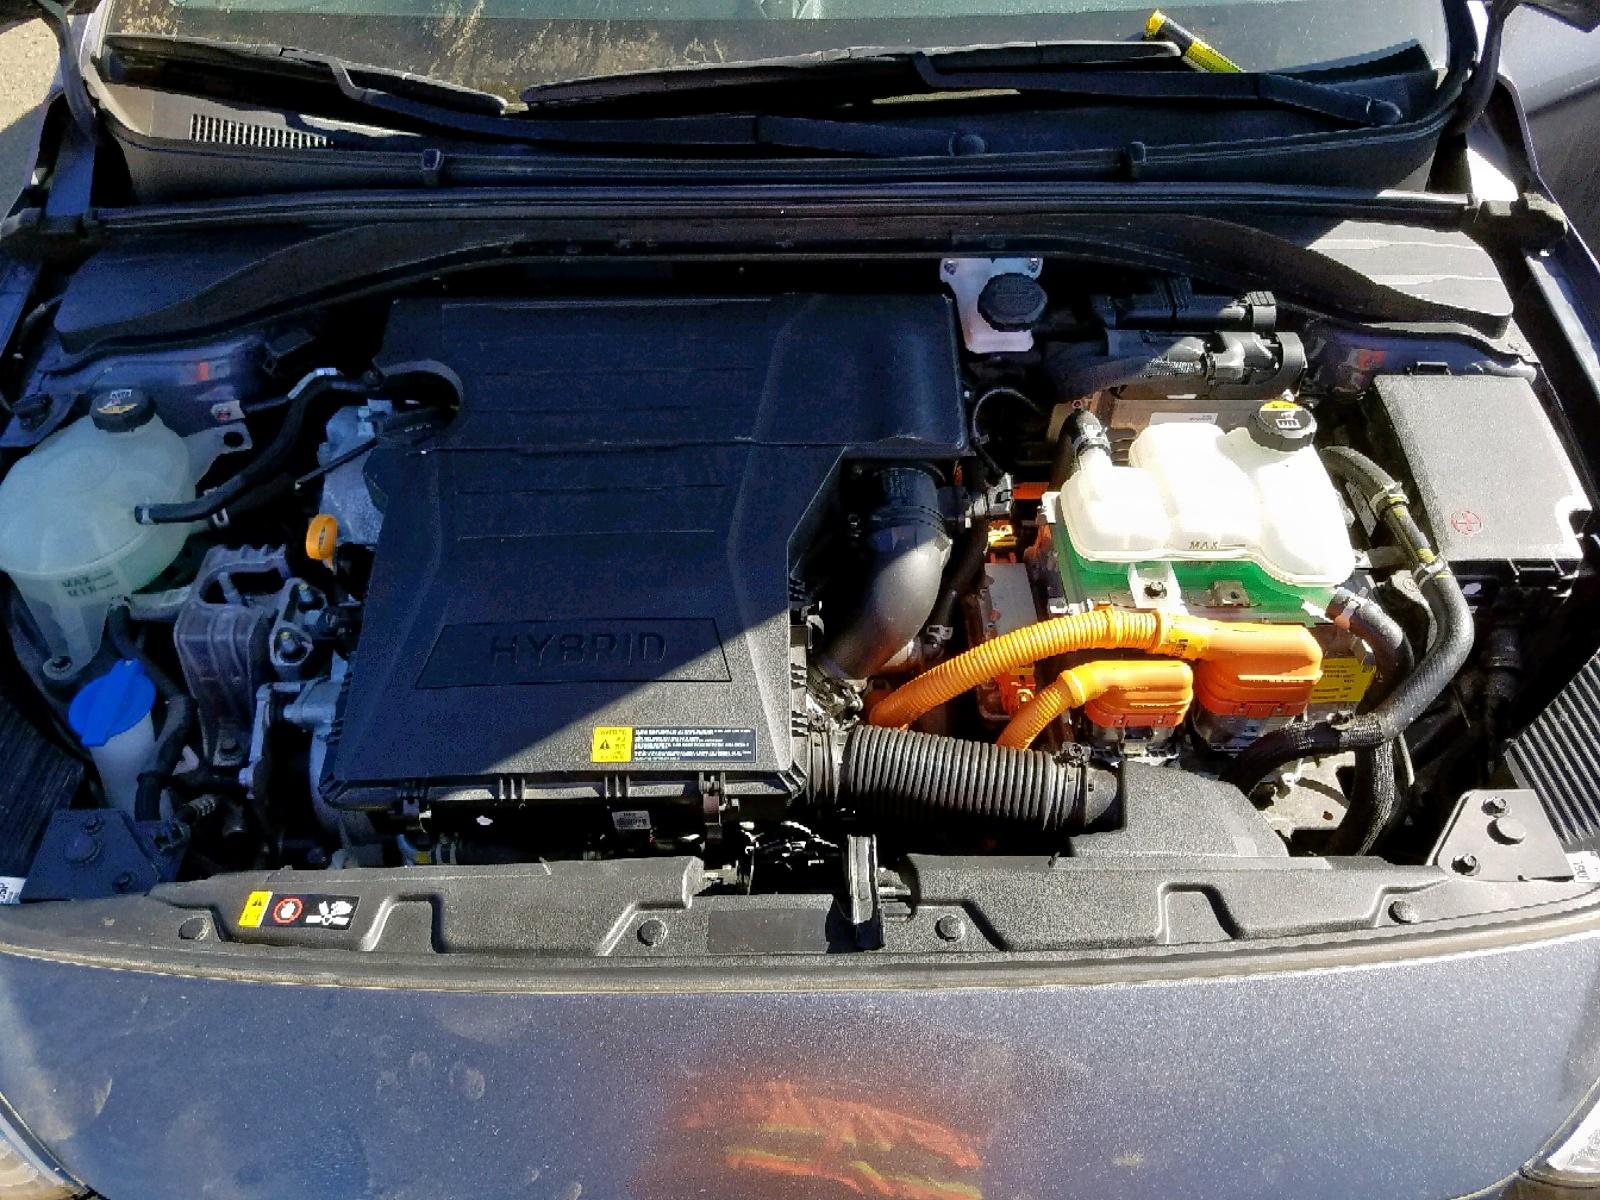 KMHC75LC2HU028247 - 2017 Hyundai Ioniq Sel 1.6L inside view